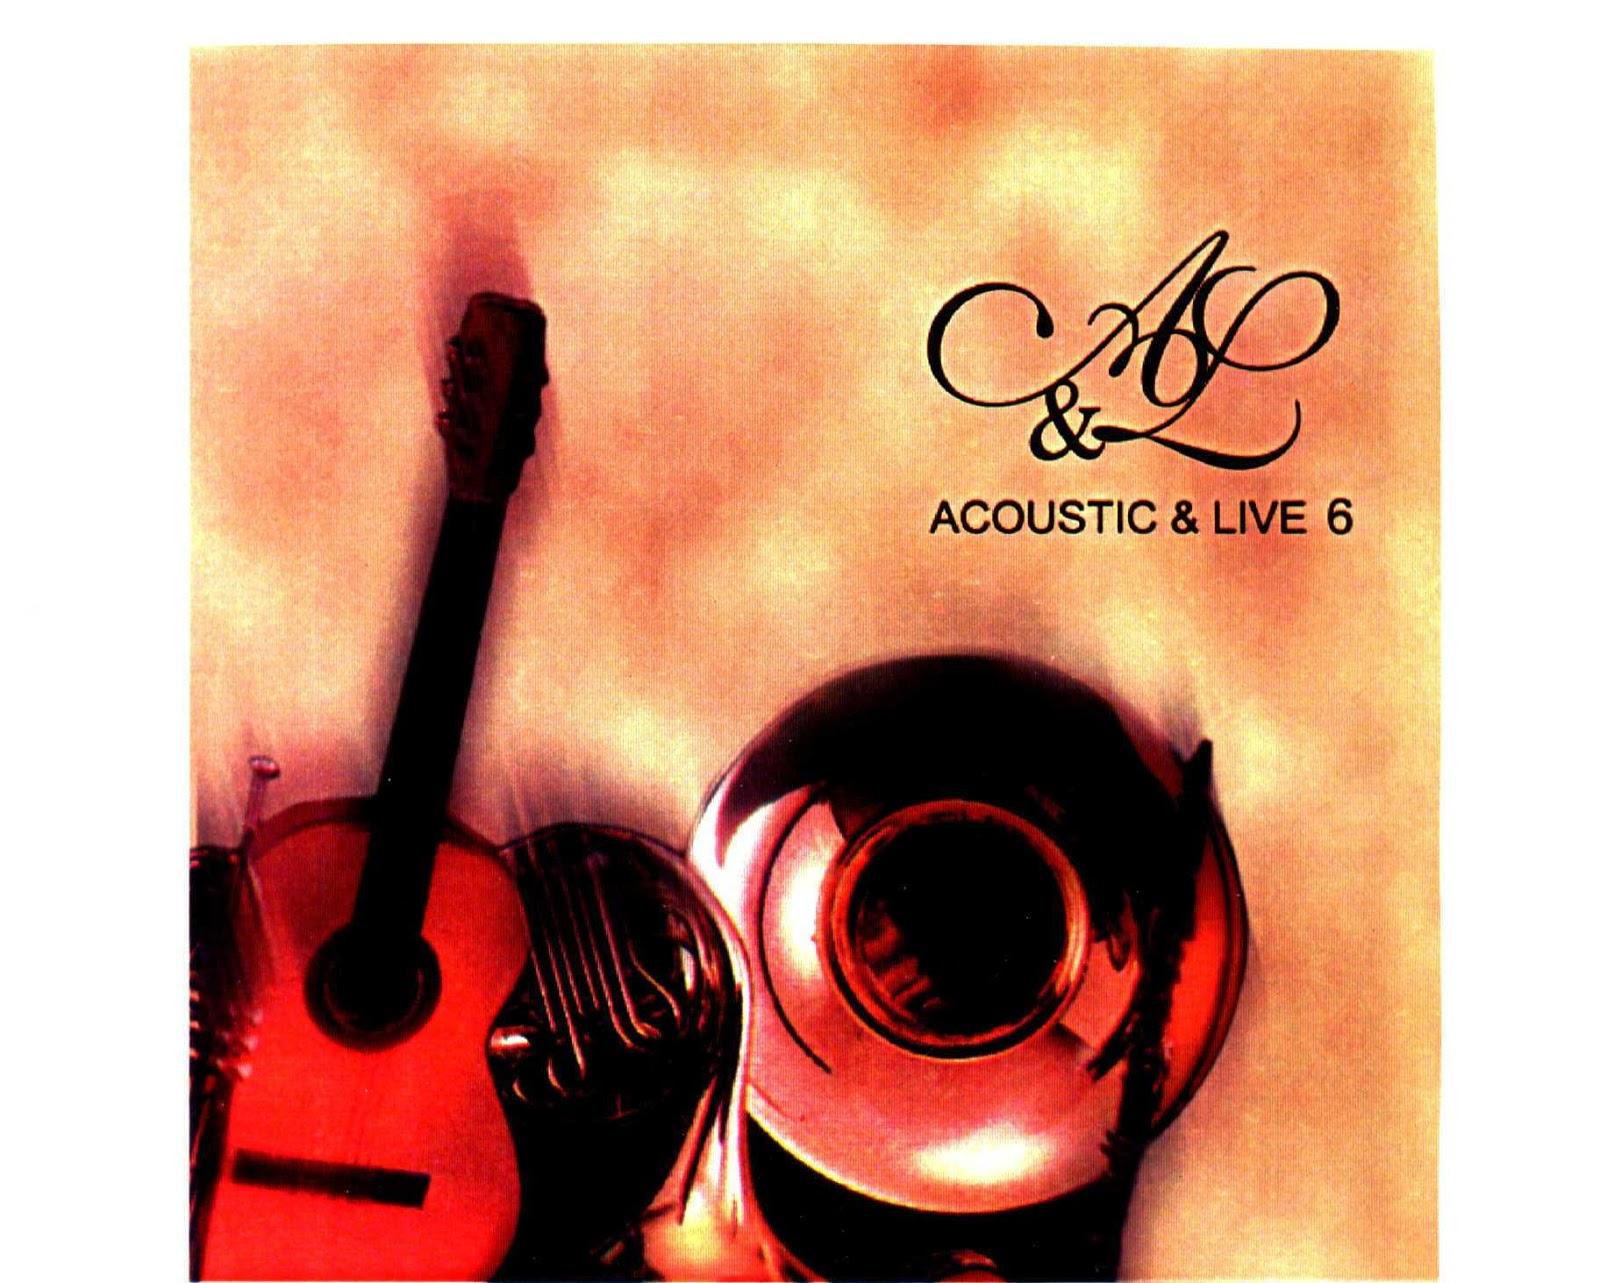 http://1.bp.blogspot.com/-ekFkZyDLf6I/TfrQm-KO2PI/AAAAAAAAADY/uPlVhsn4ceM/s1600/Acoustic+%2526+Live+6+-+Tapa.JPG